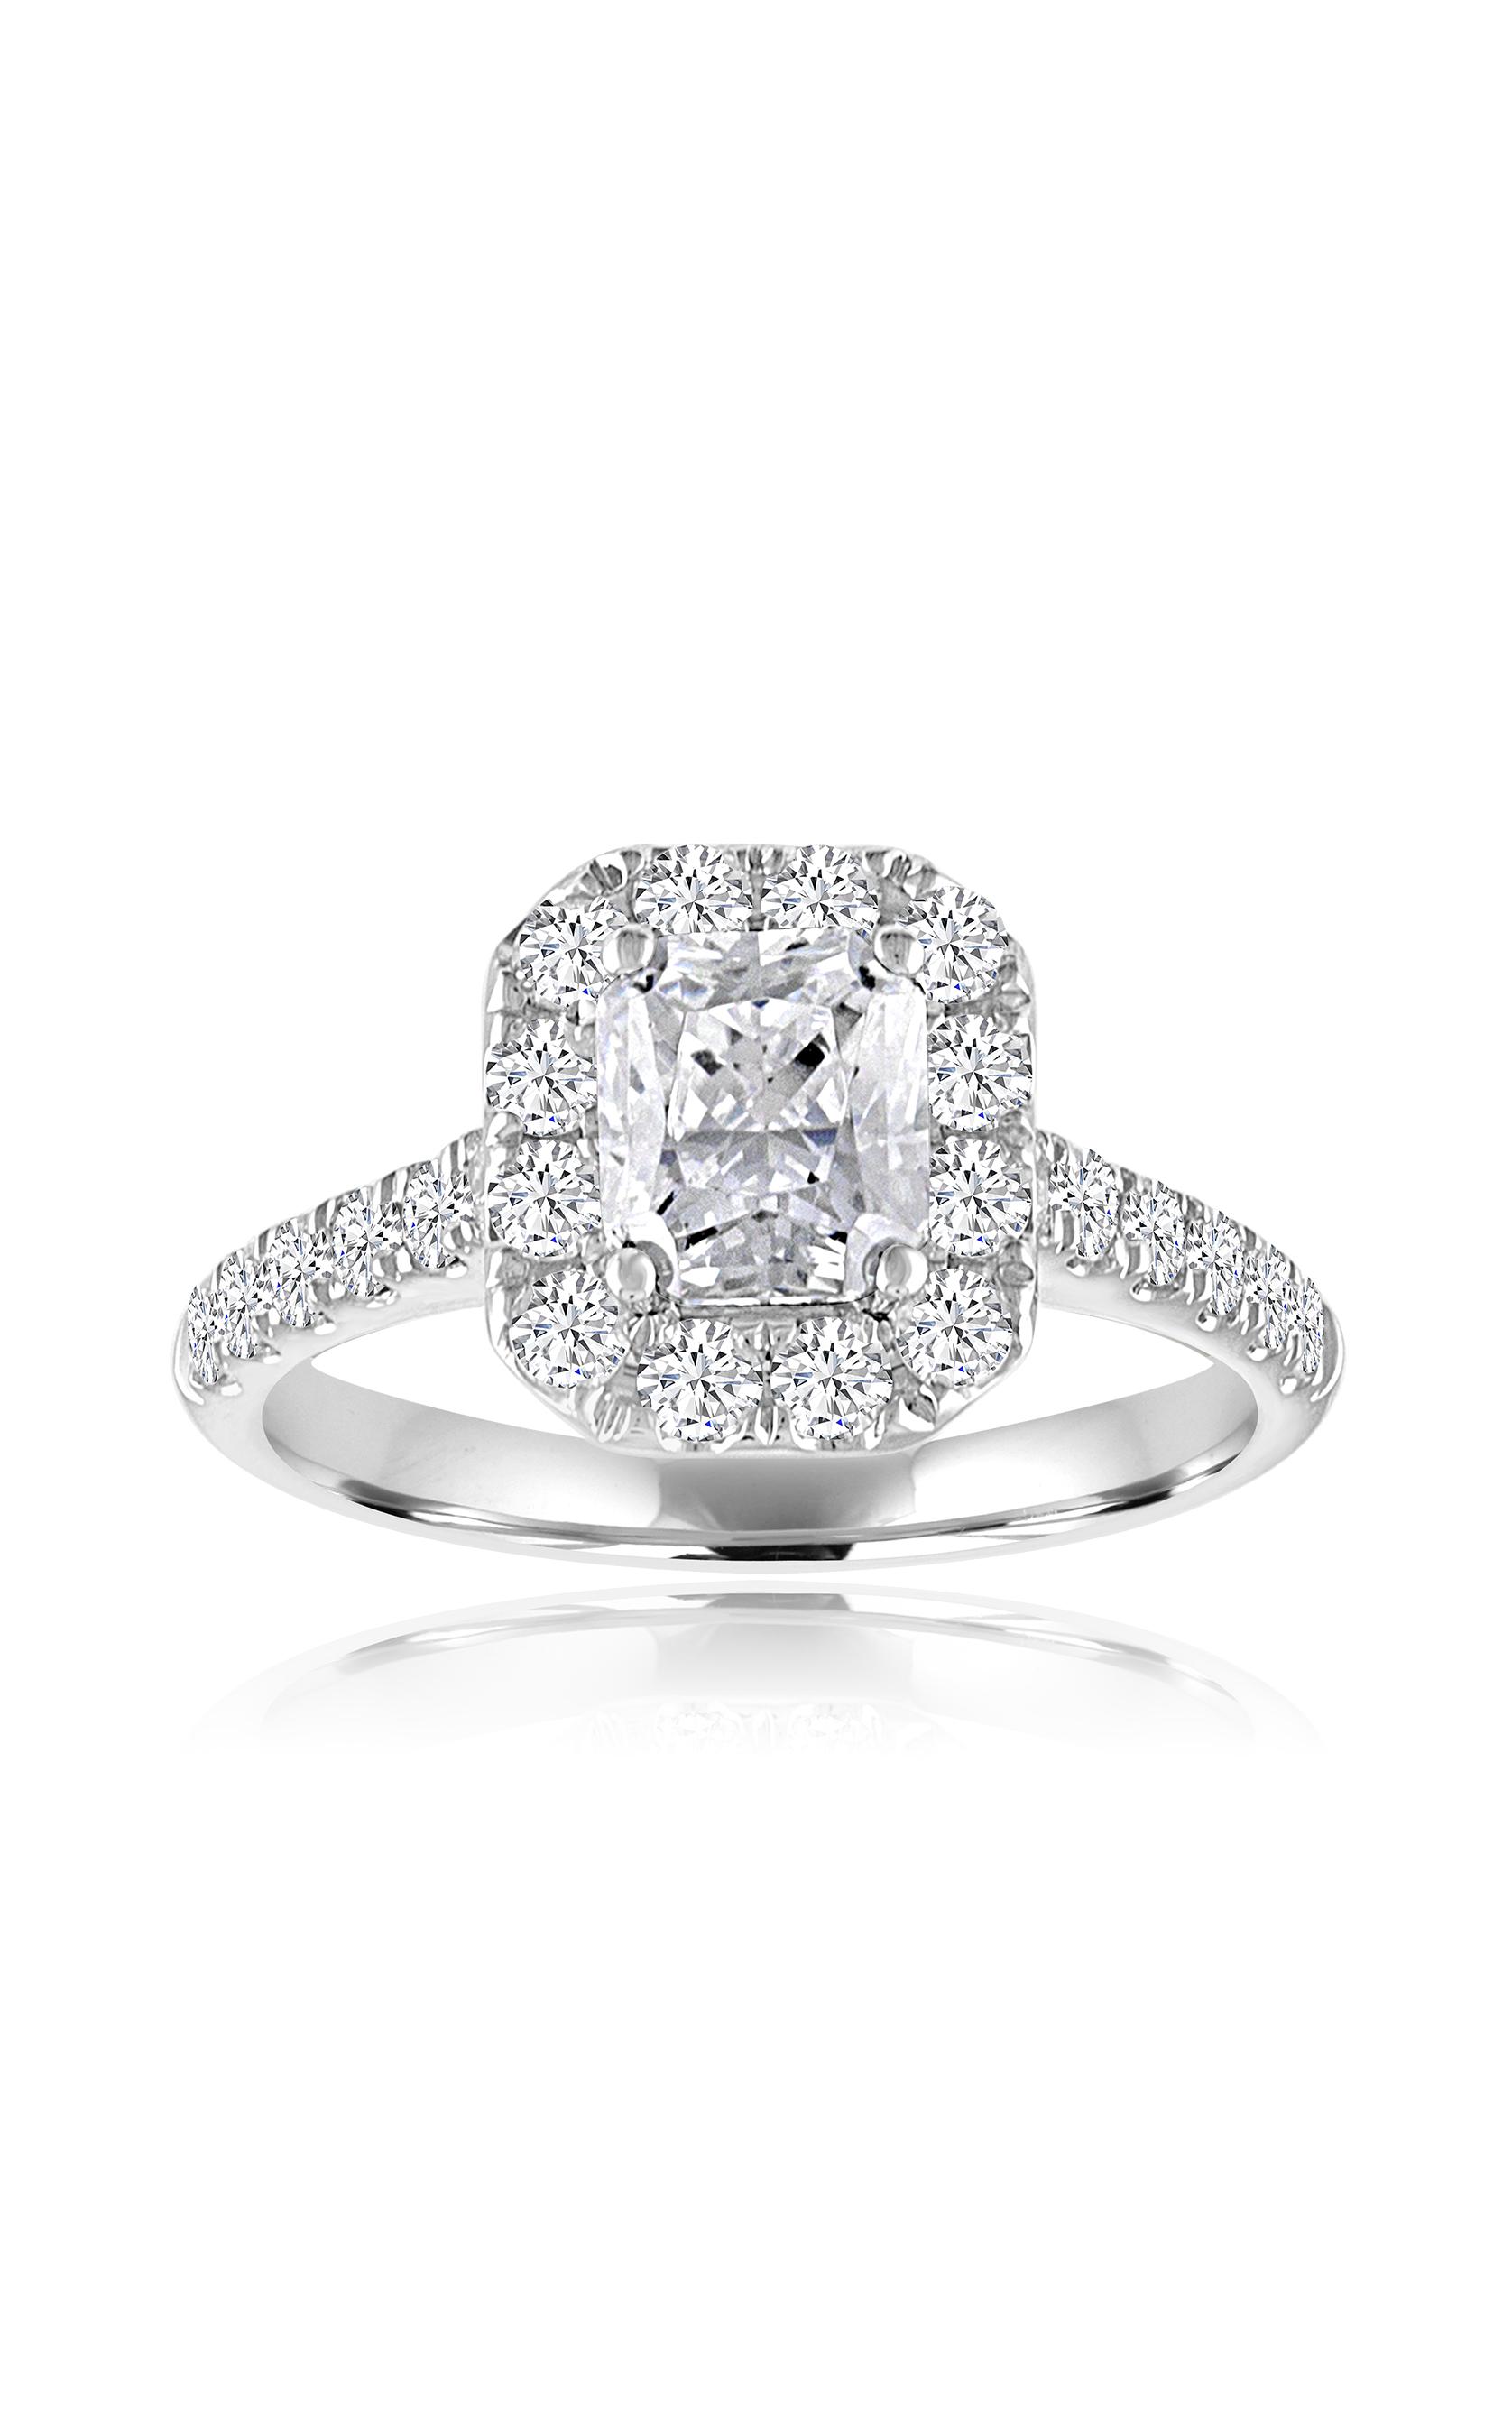 Imagine Bridal Engagement Ring 63246D-3/4 product image